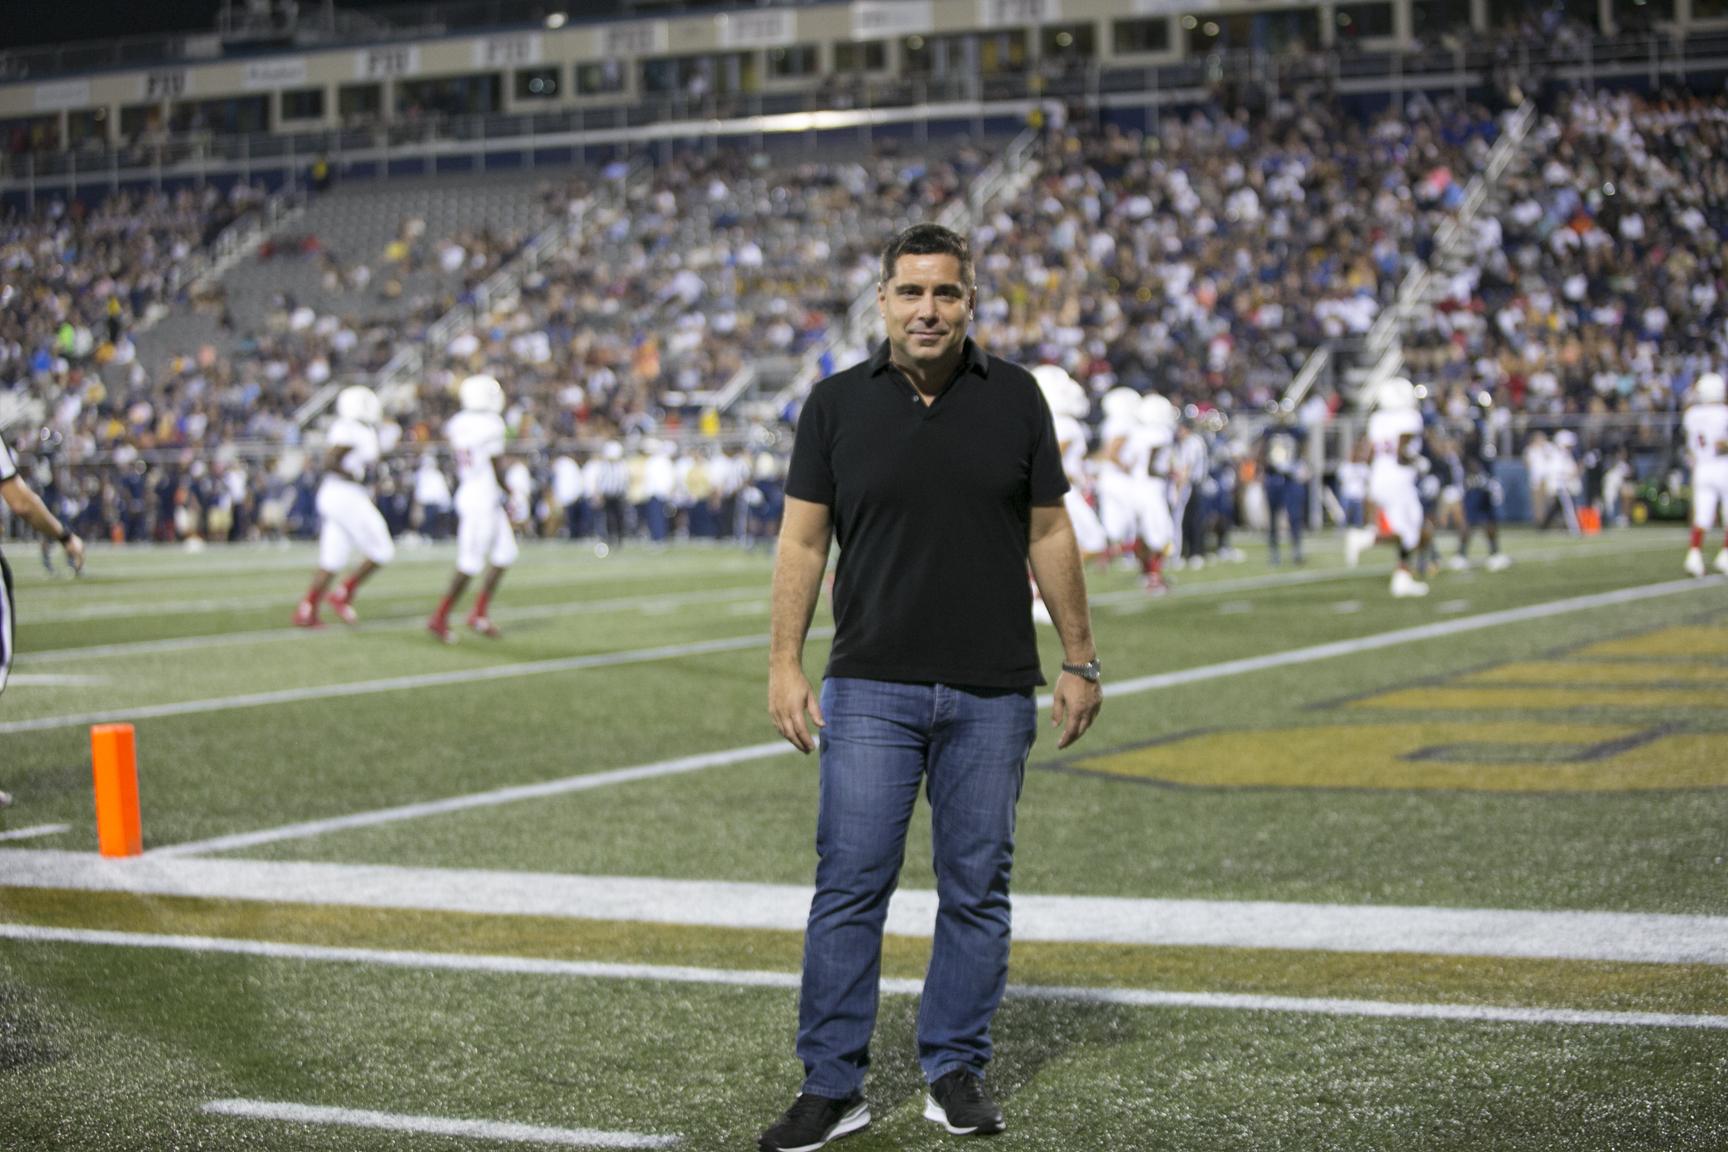 Riccardo Silva at Riccardo Silva Stadium in Miami, Florida